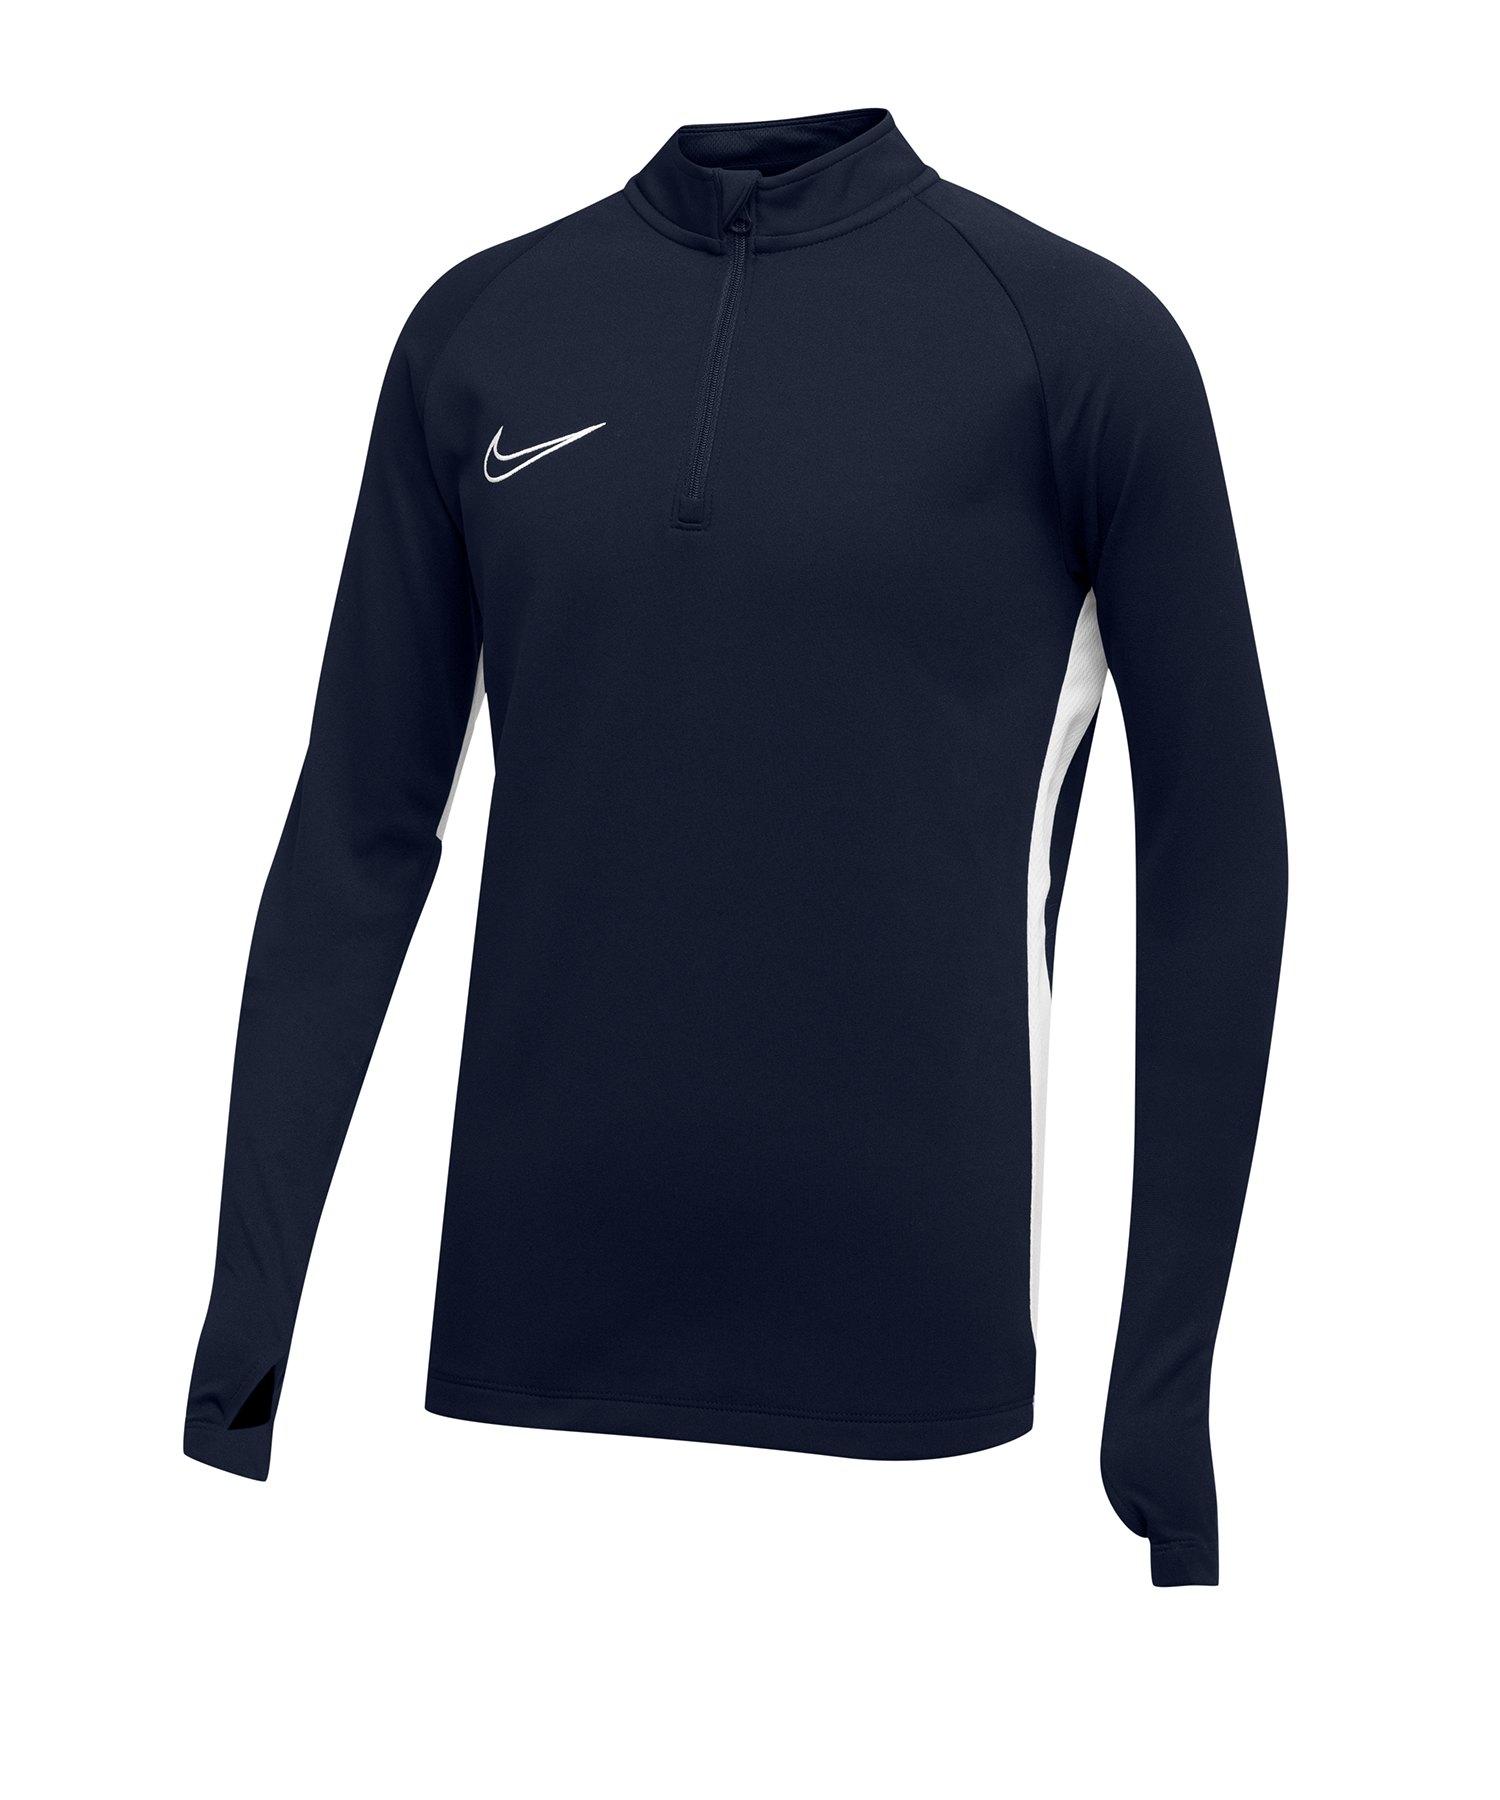 Nike Academy 19 1/4 Zip Drill Top Kids Blau F451 - Blau